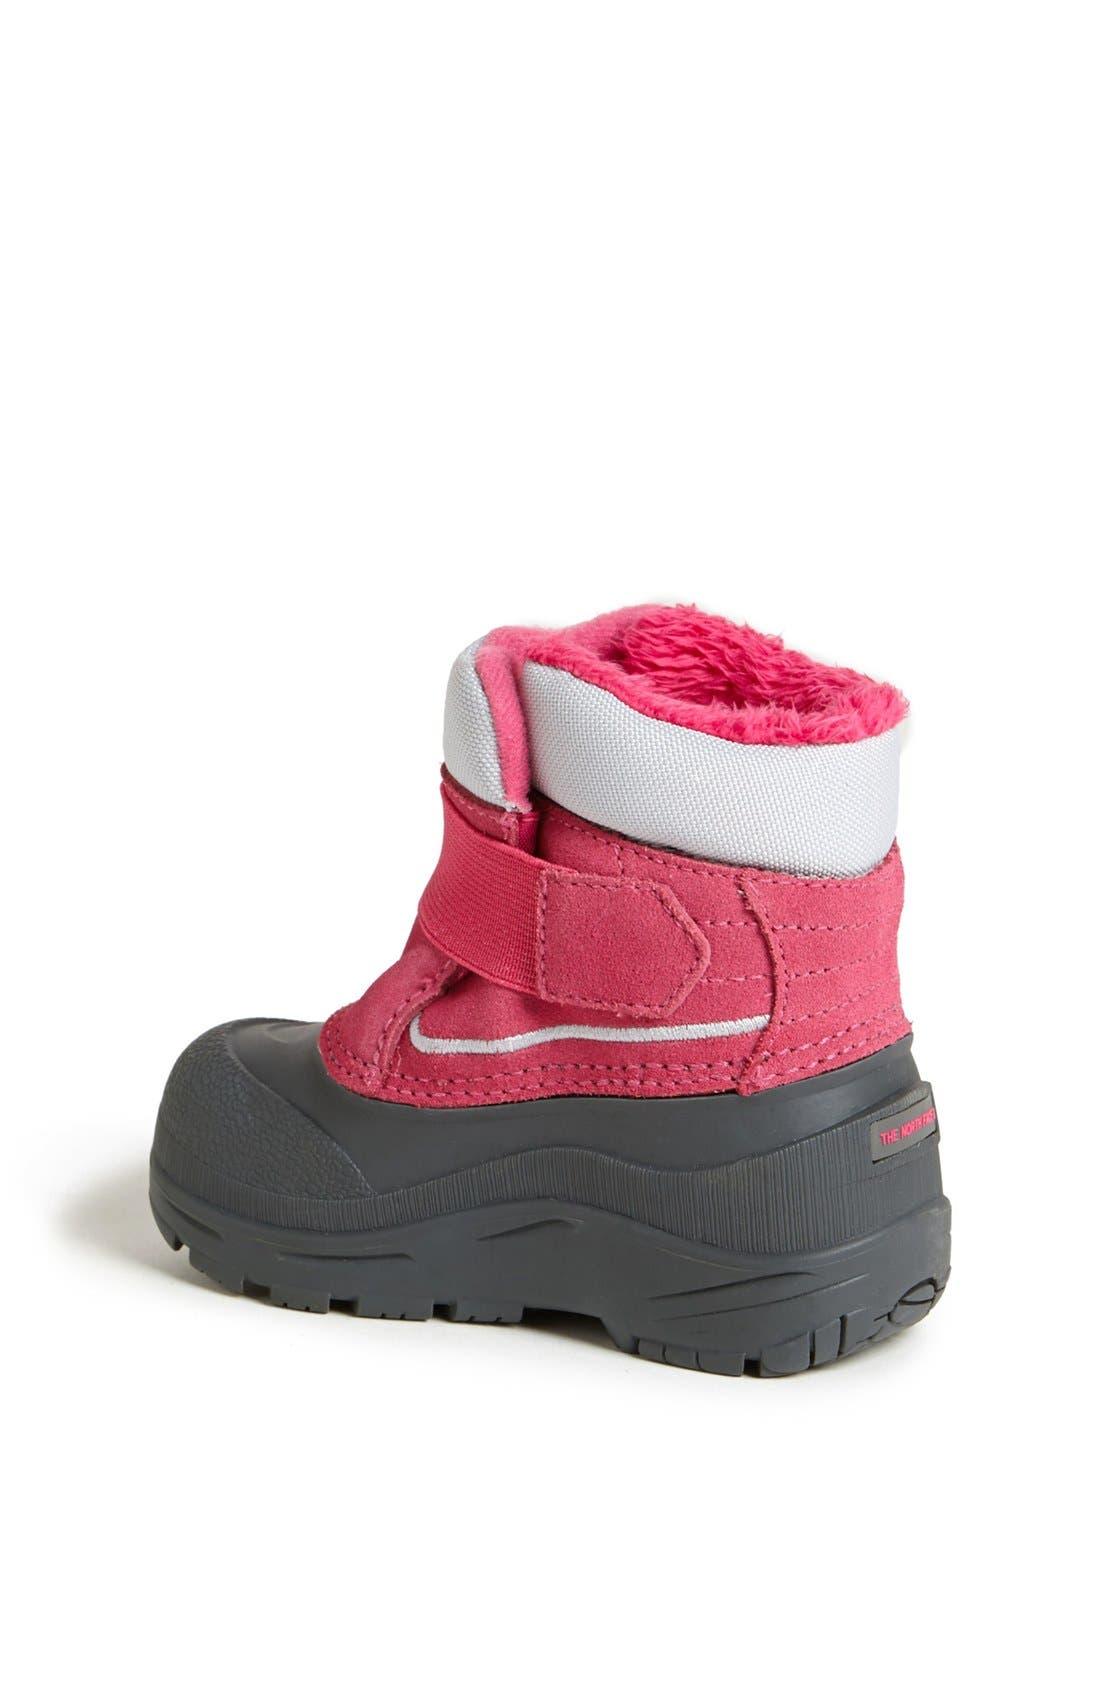 Alternate Image 2  - The North Face 'Powder Hound' Waterproof Snow Boot (Walker & Toddler)